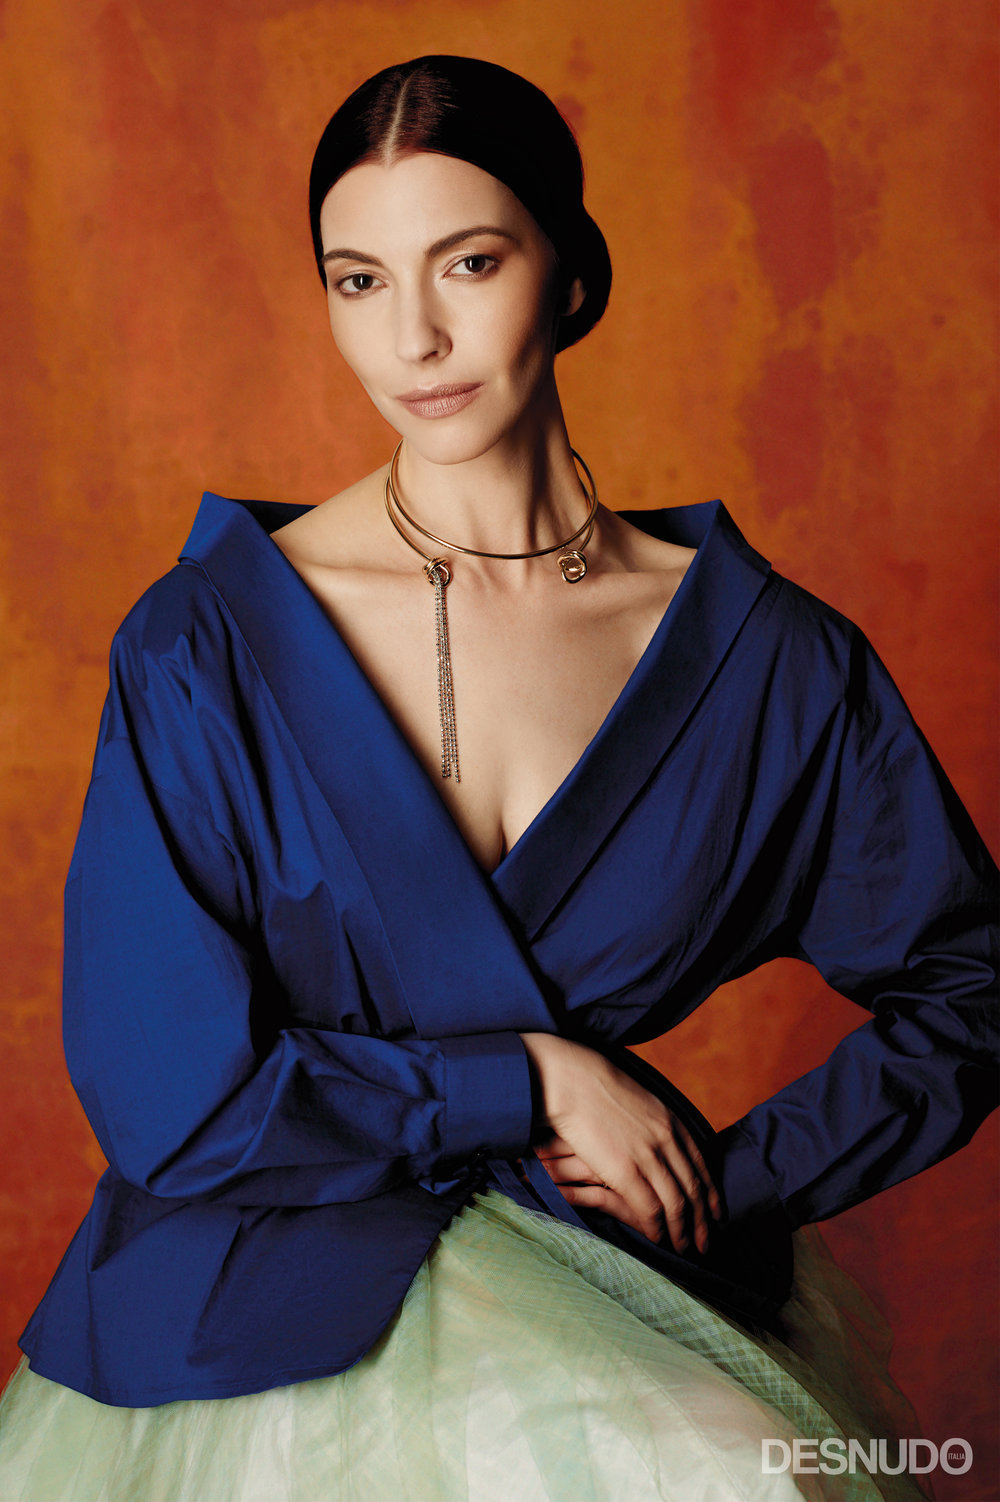 shirt  STELLA JEAN , skirt  MAISON LUIGI BORBONE , necklace  GIULIA MANCINELLI BONAFACCIA